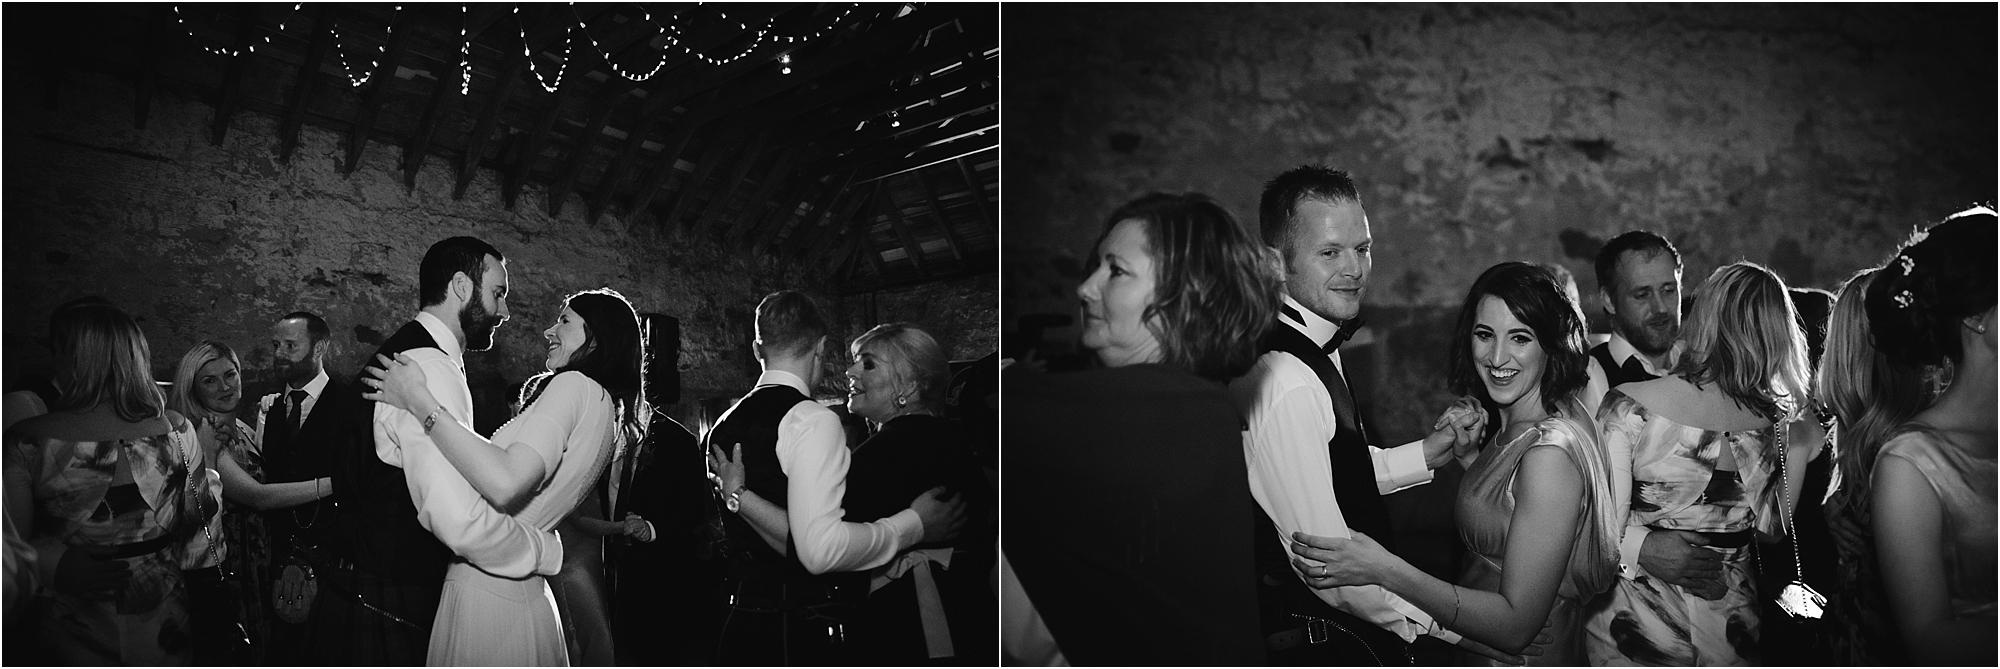 Scott+Joanna-Kinkell-Byre-wedding-fife-photography__0099.jpg